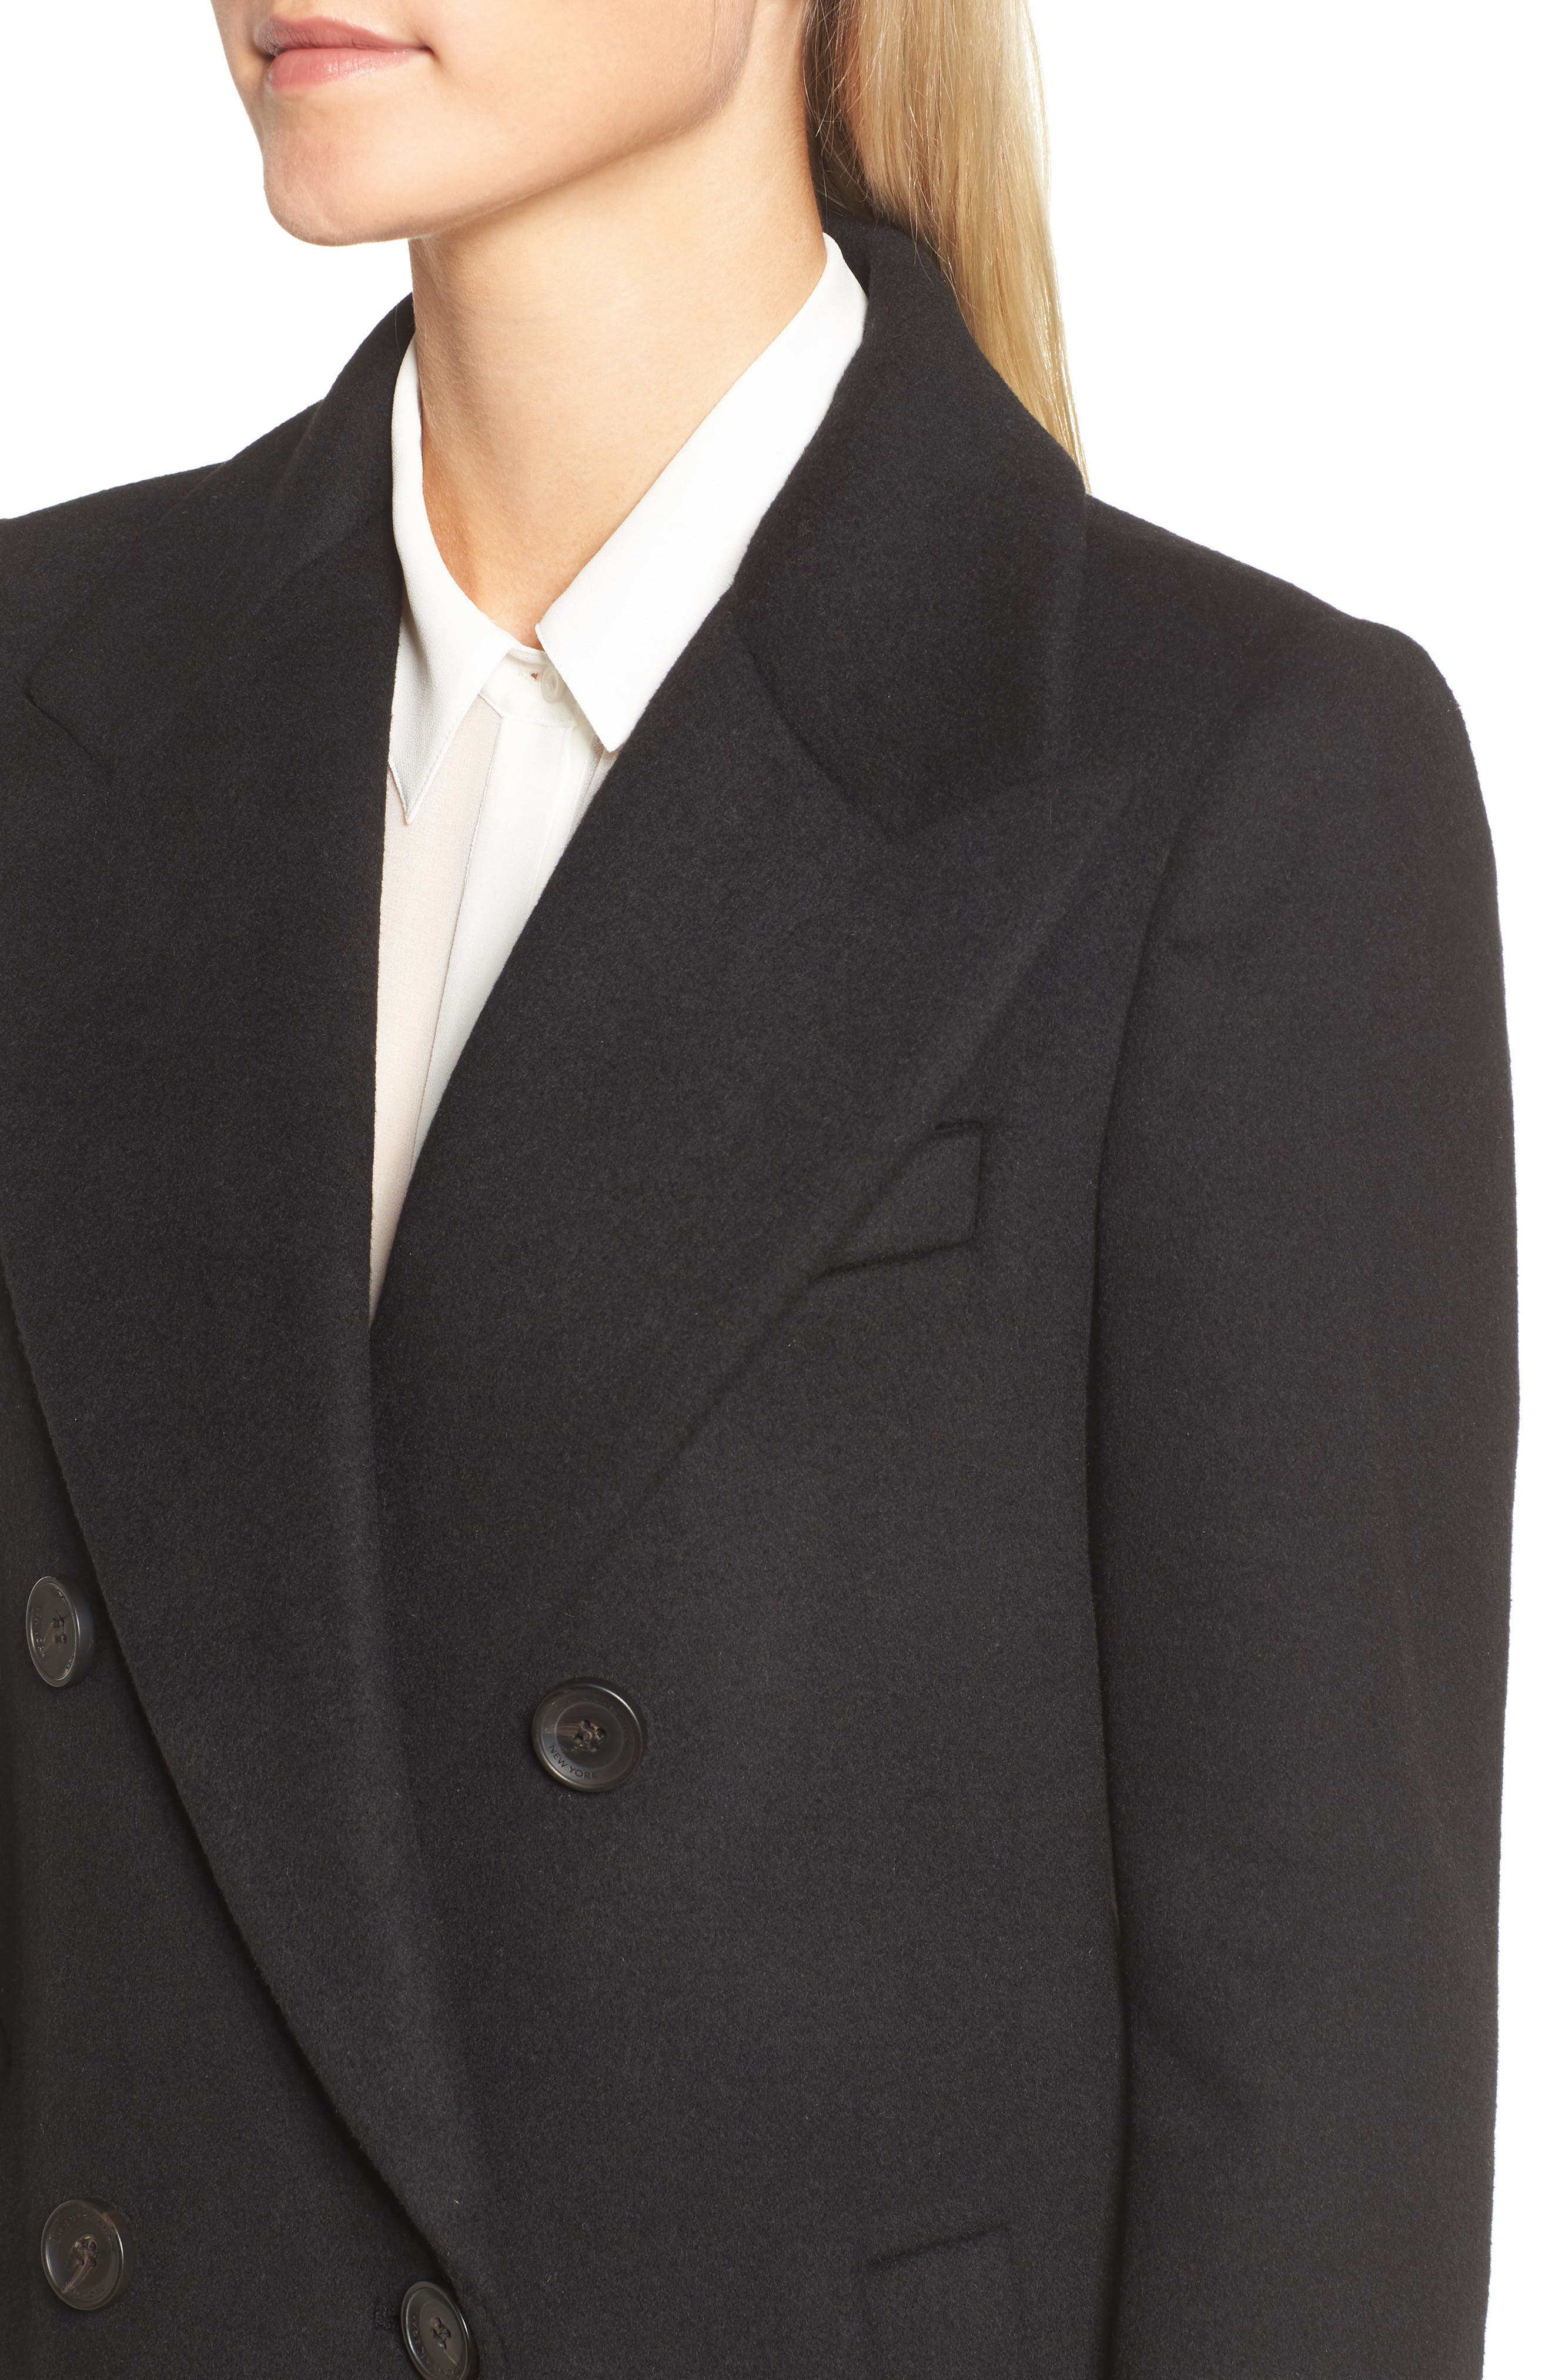 DKNY Lavish Wool Blend Coat,                             Alternate thumbnail 4, color,                             001